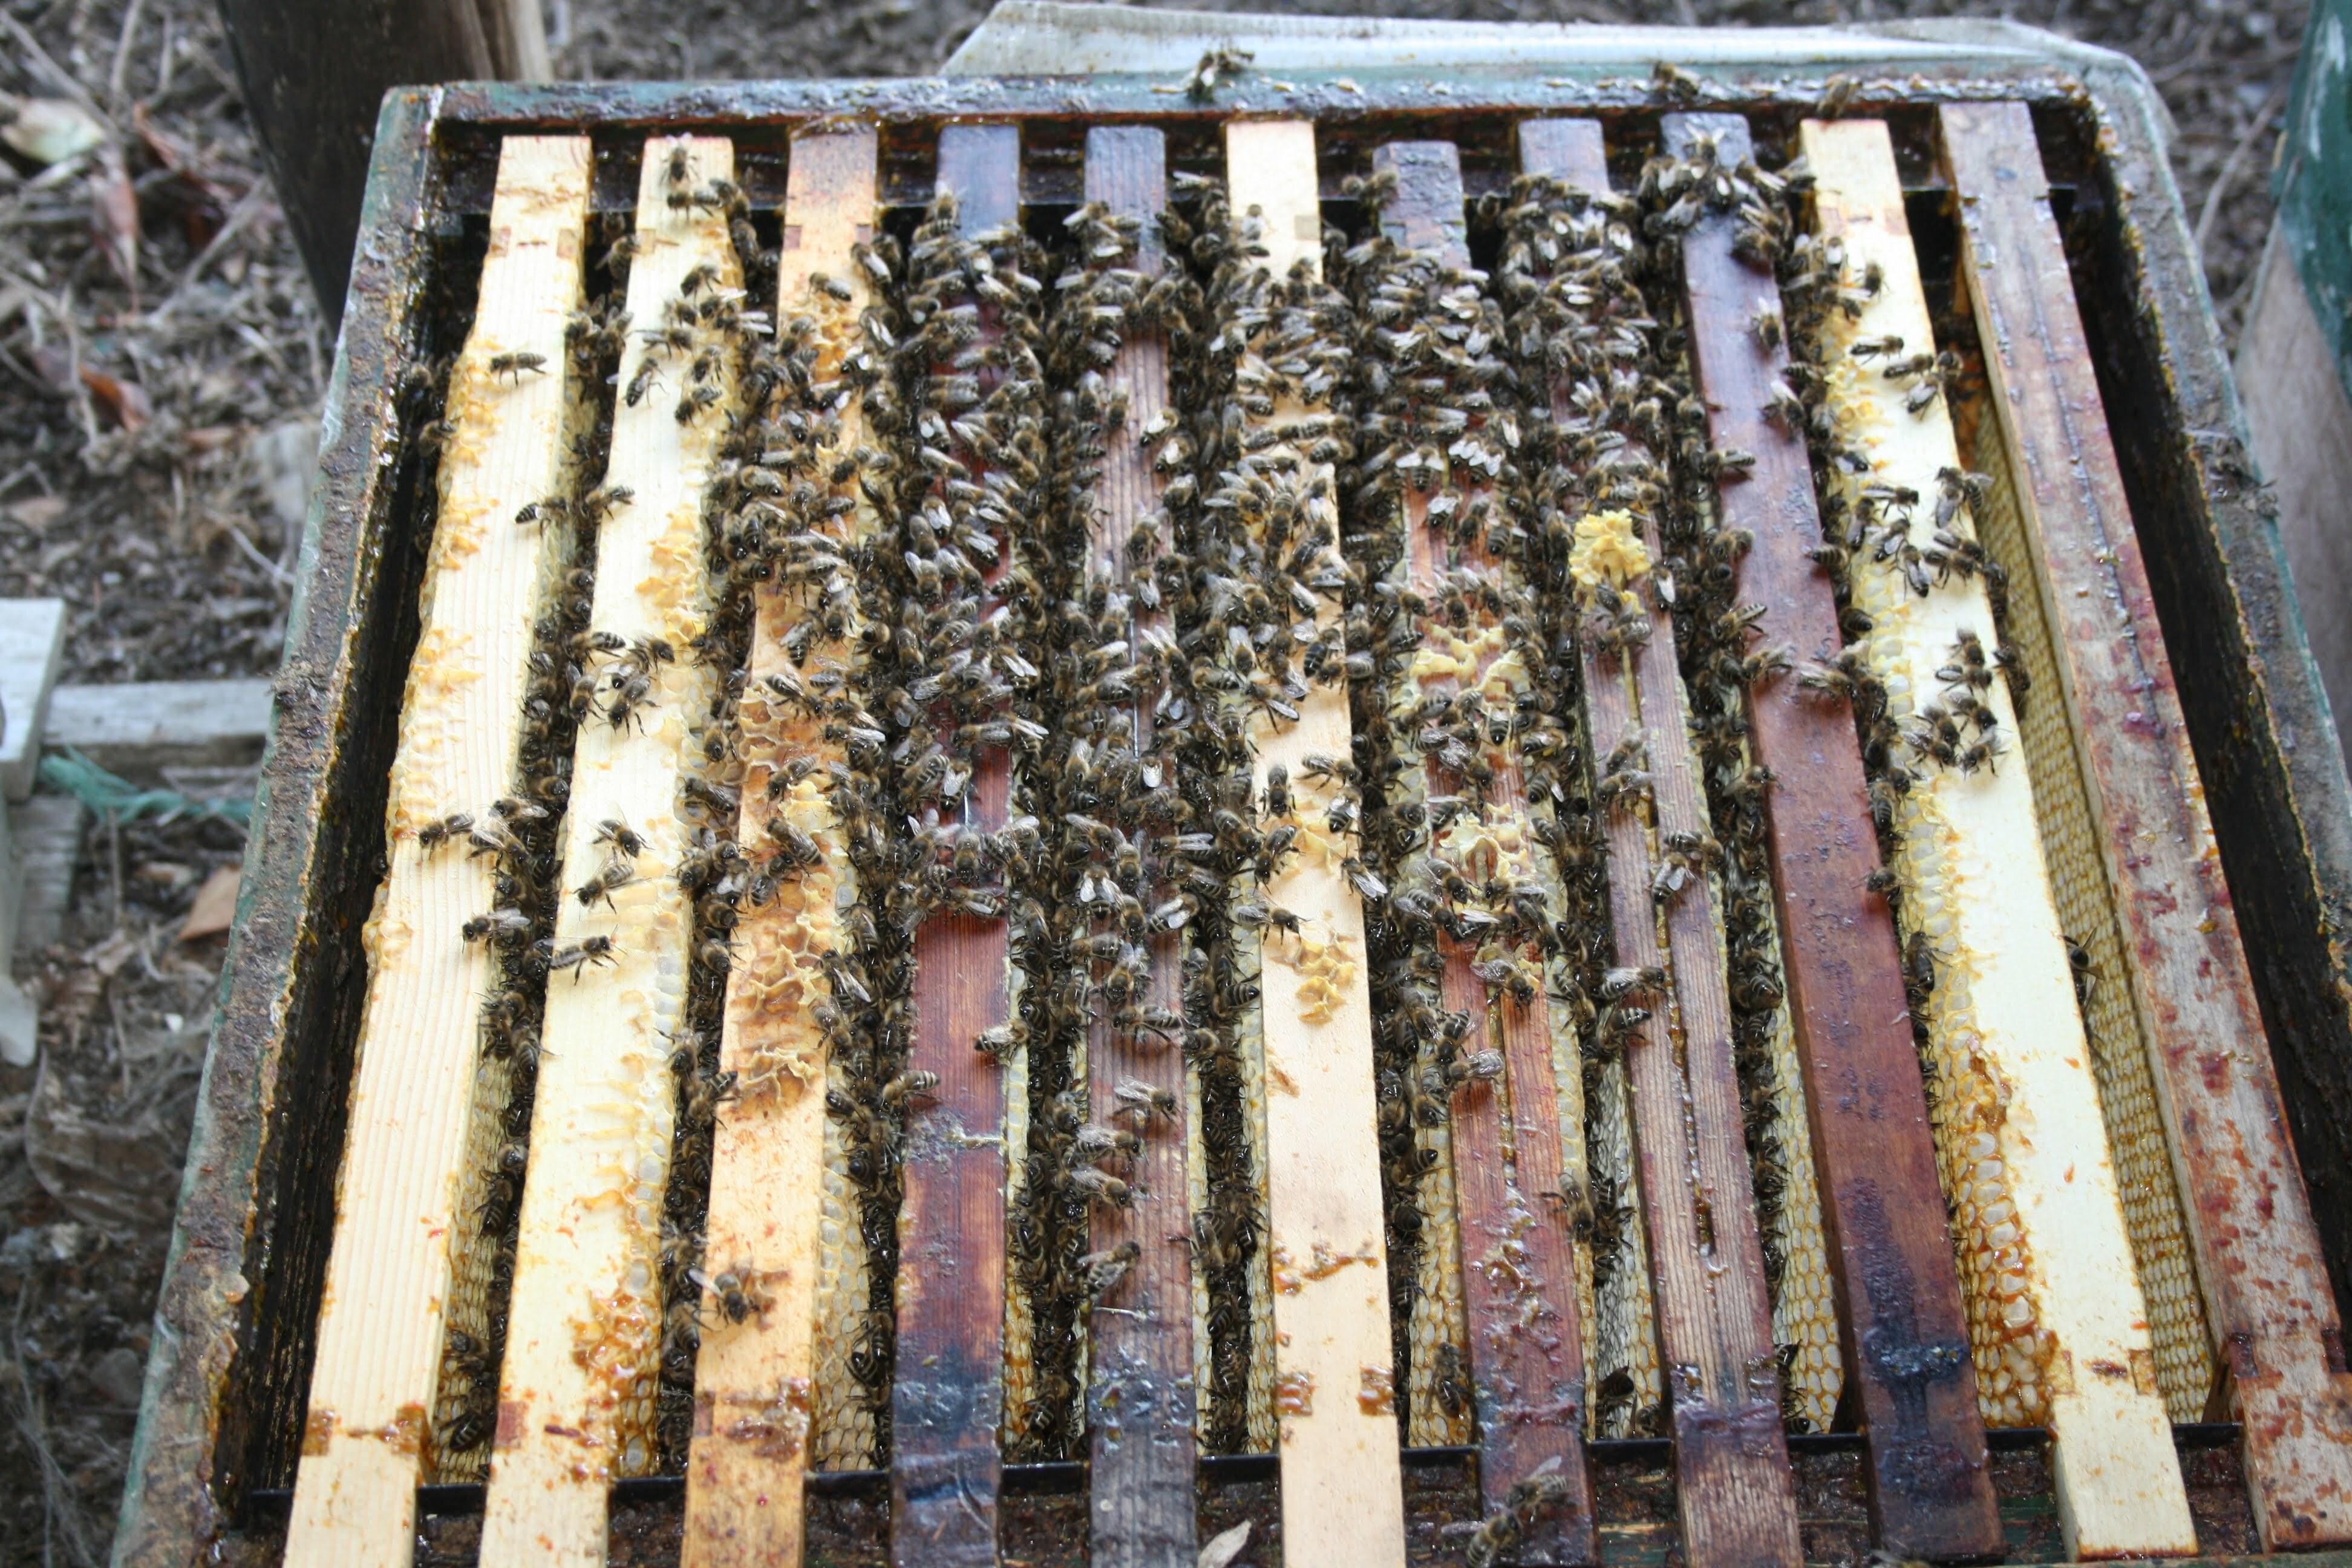 Wat Doen De Bijen In De Winter Imkerij De Drakenbijen